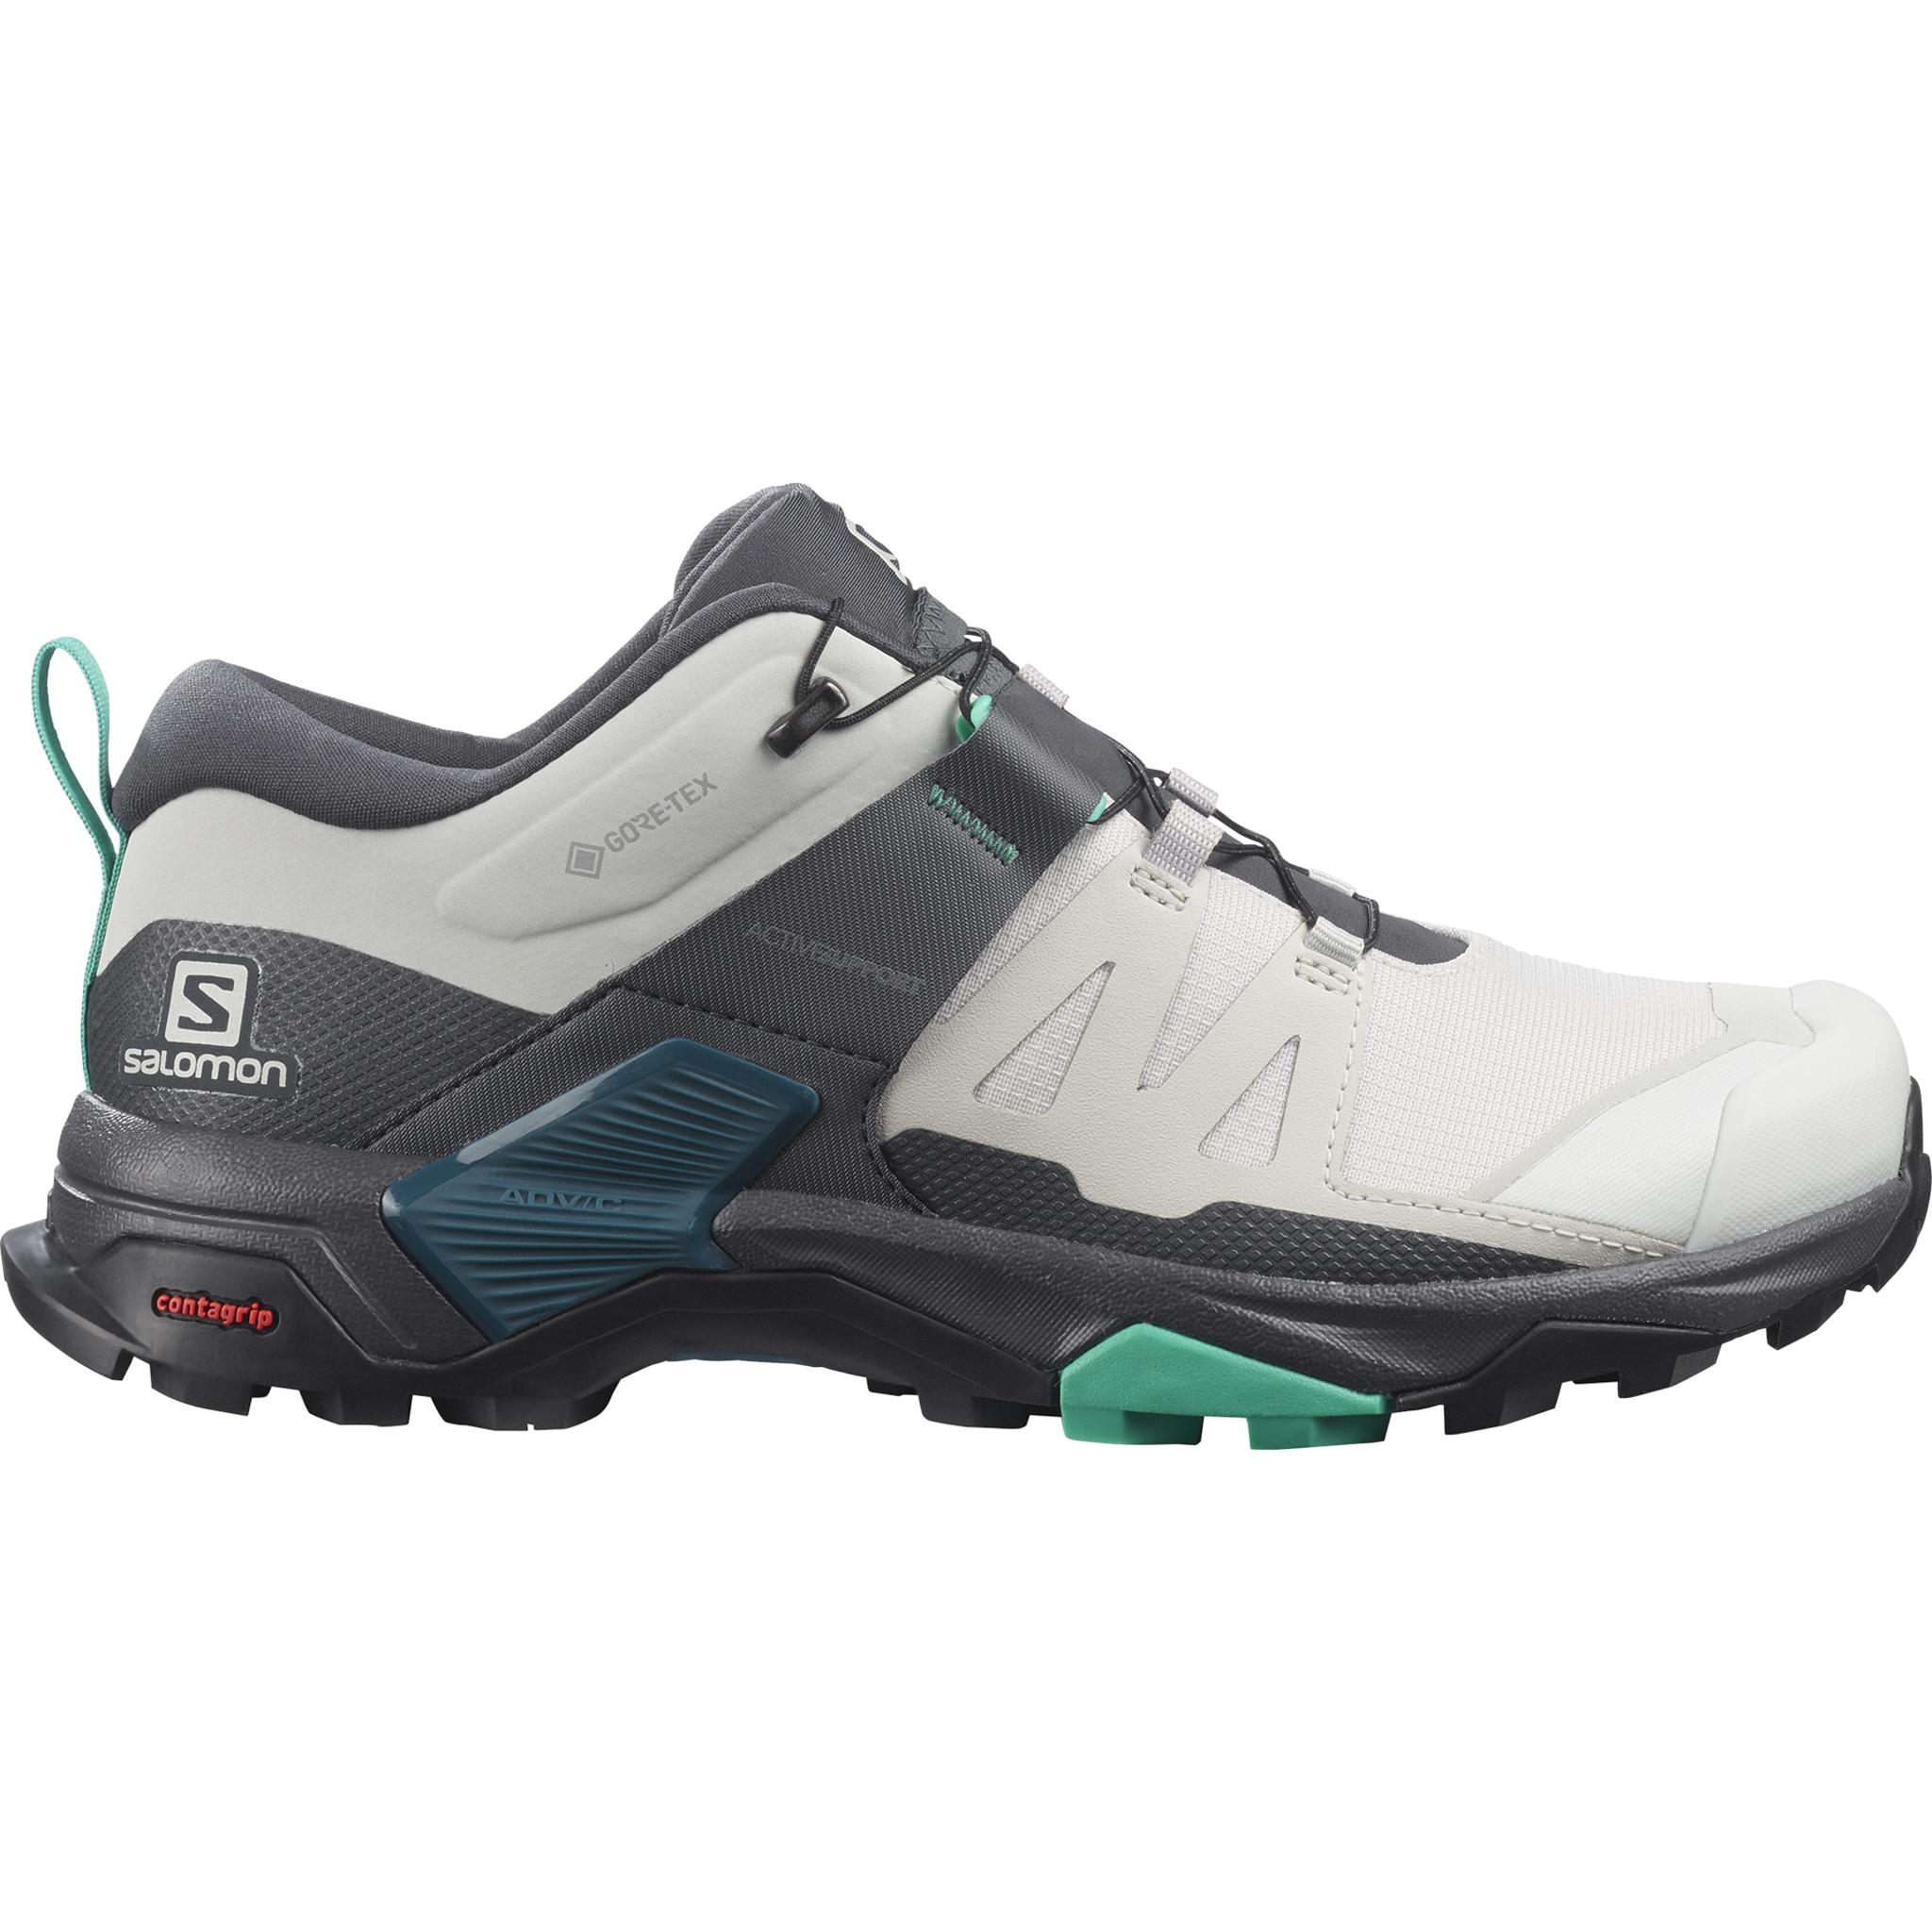 Salomon X Ultra 4 Gtx, hikingsko dame 40 2/3 Lunroc/ebony/mint